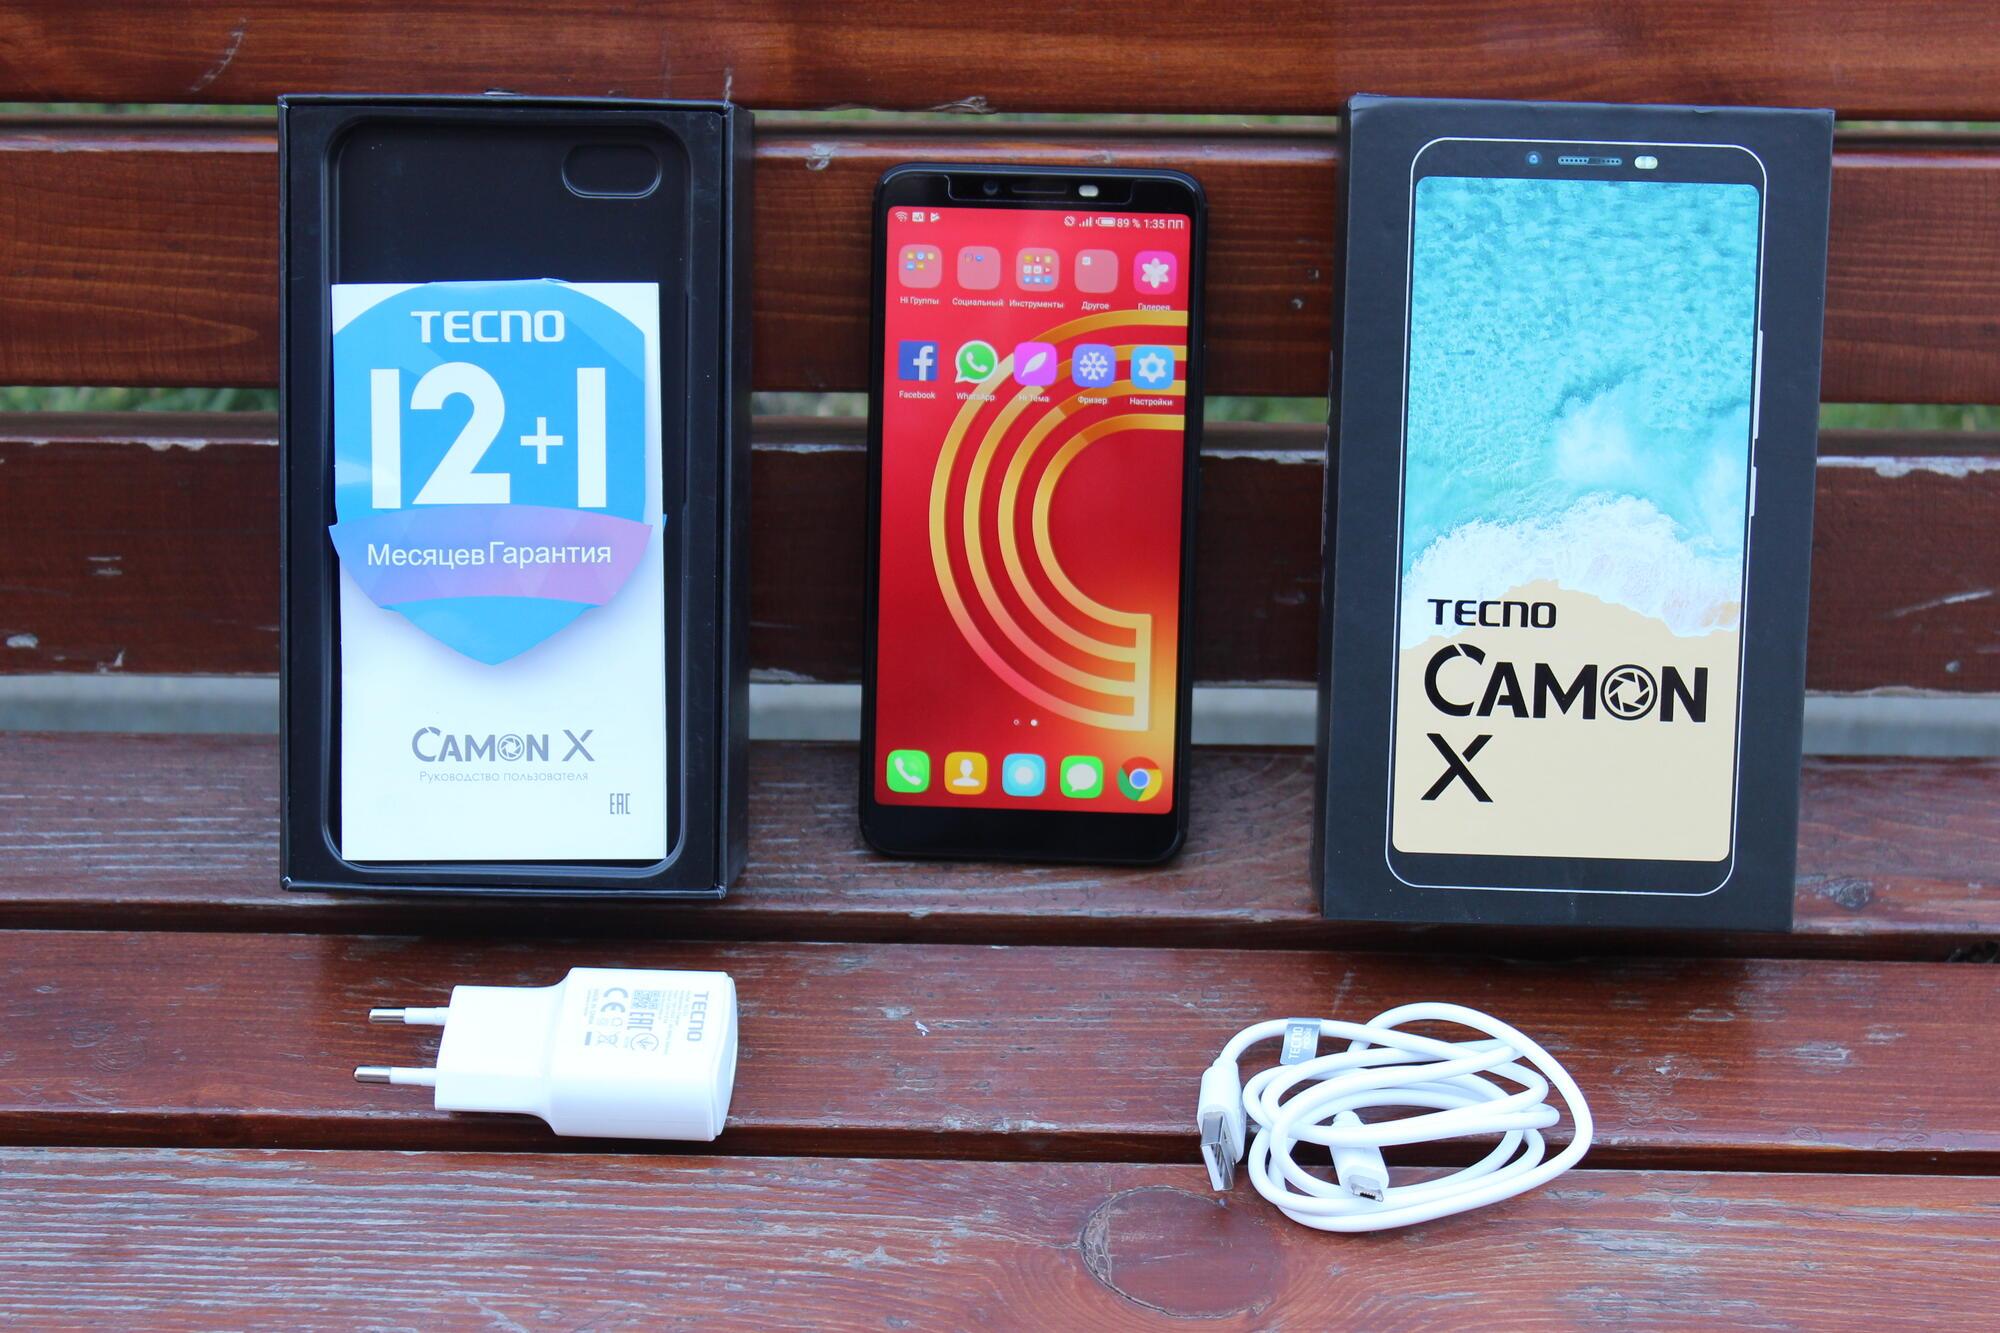 Smartfony i aksessuary - Tonkiy i moshcnyy smartfon TECNO CAMON X